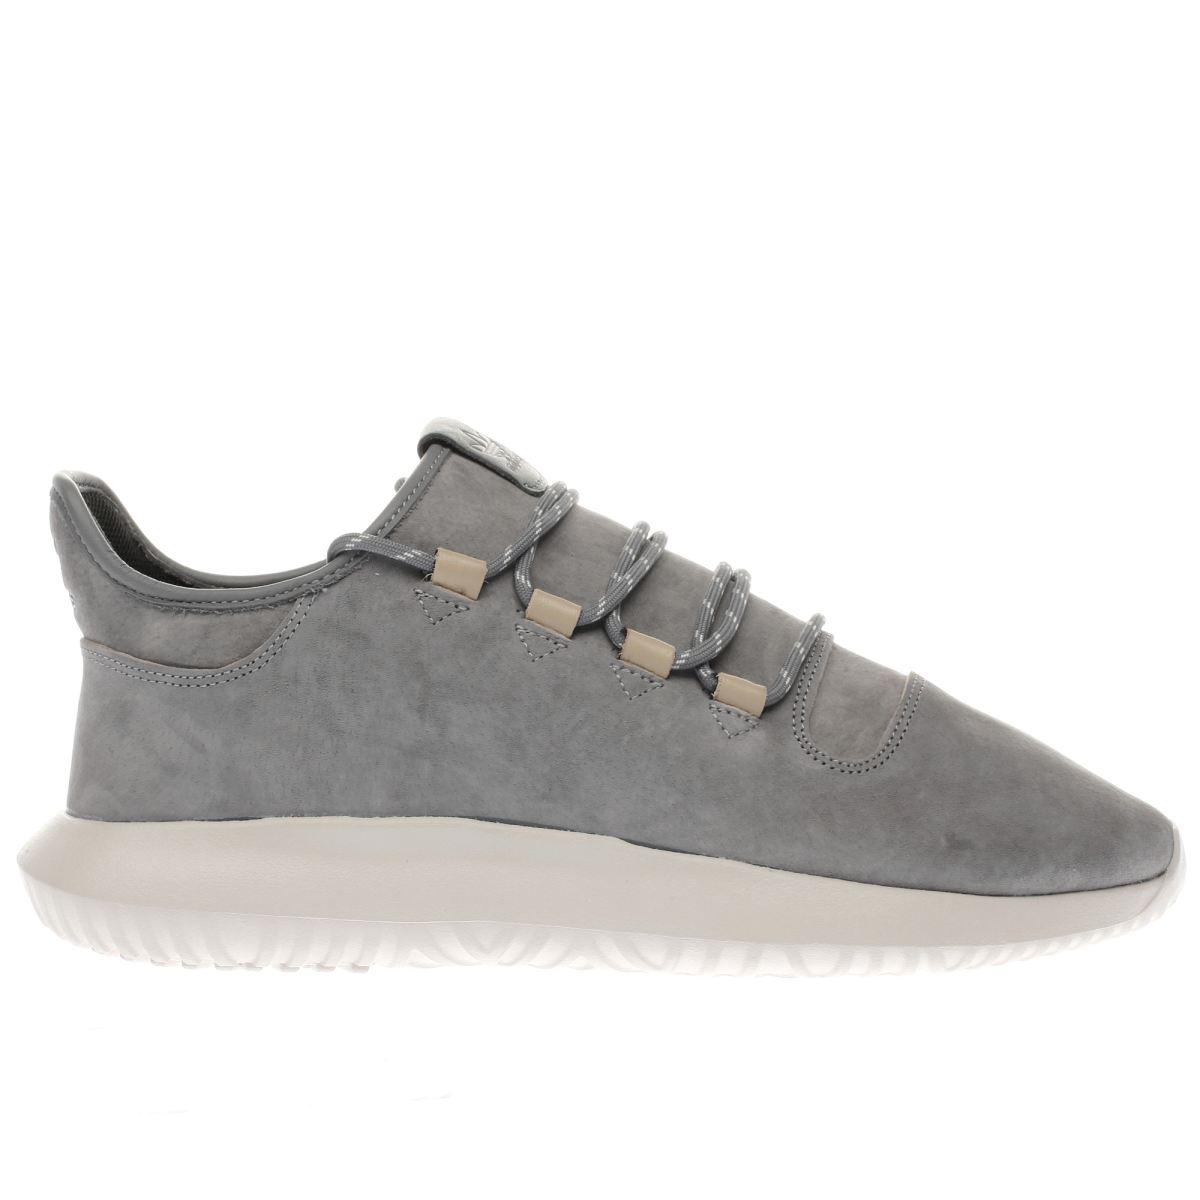 adidas grey tubular shadow trainers